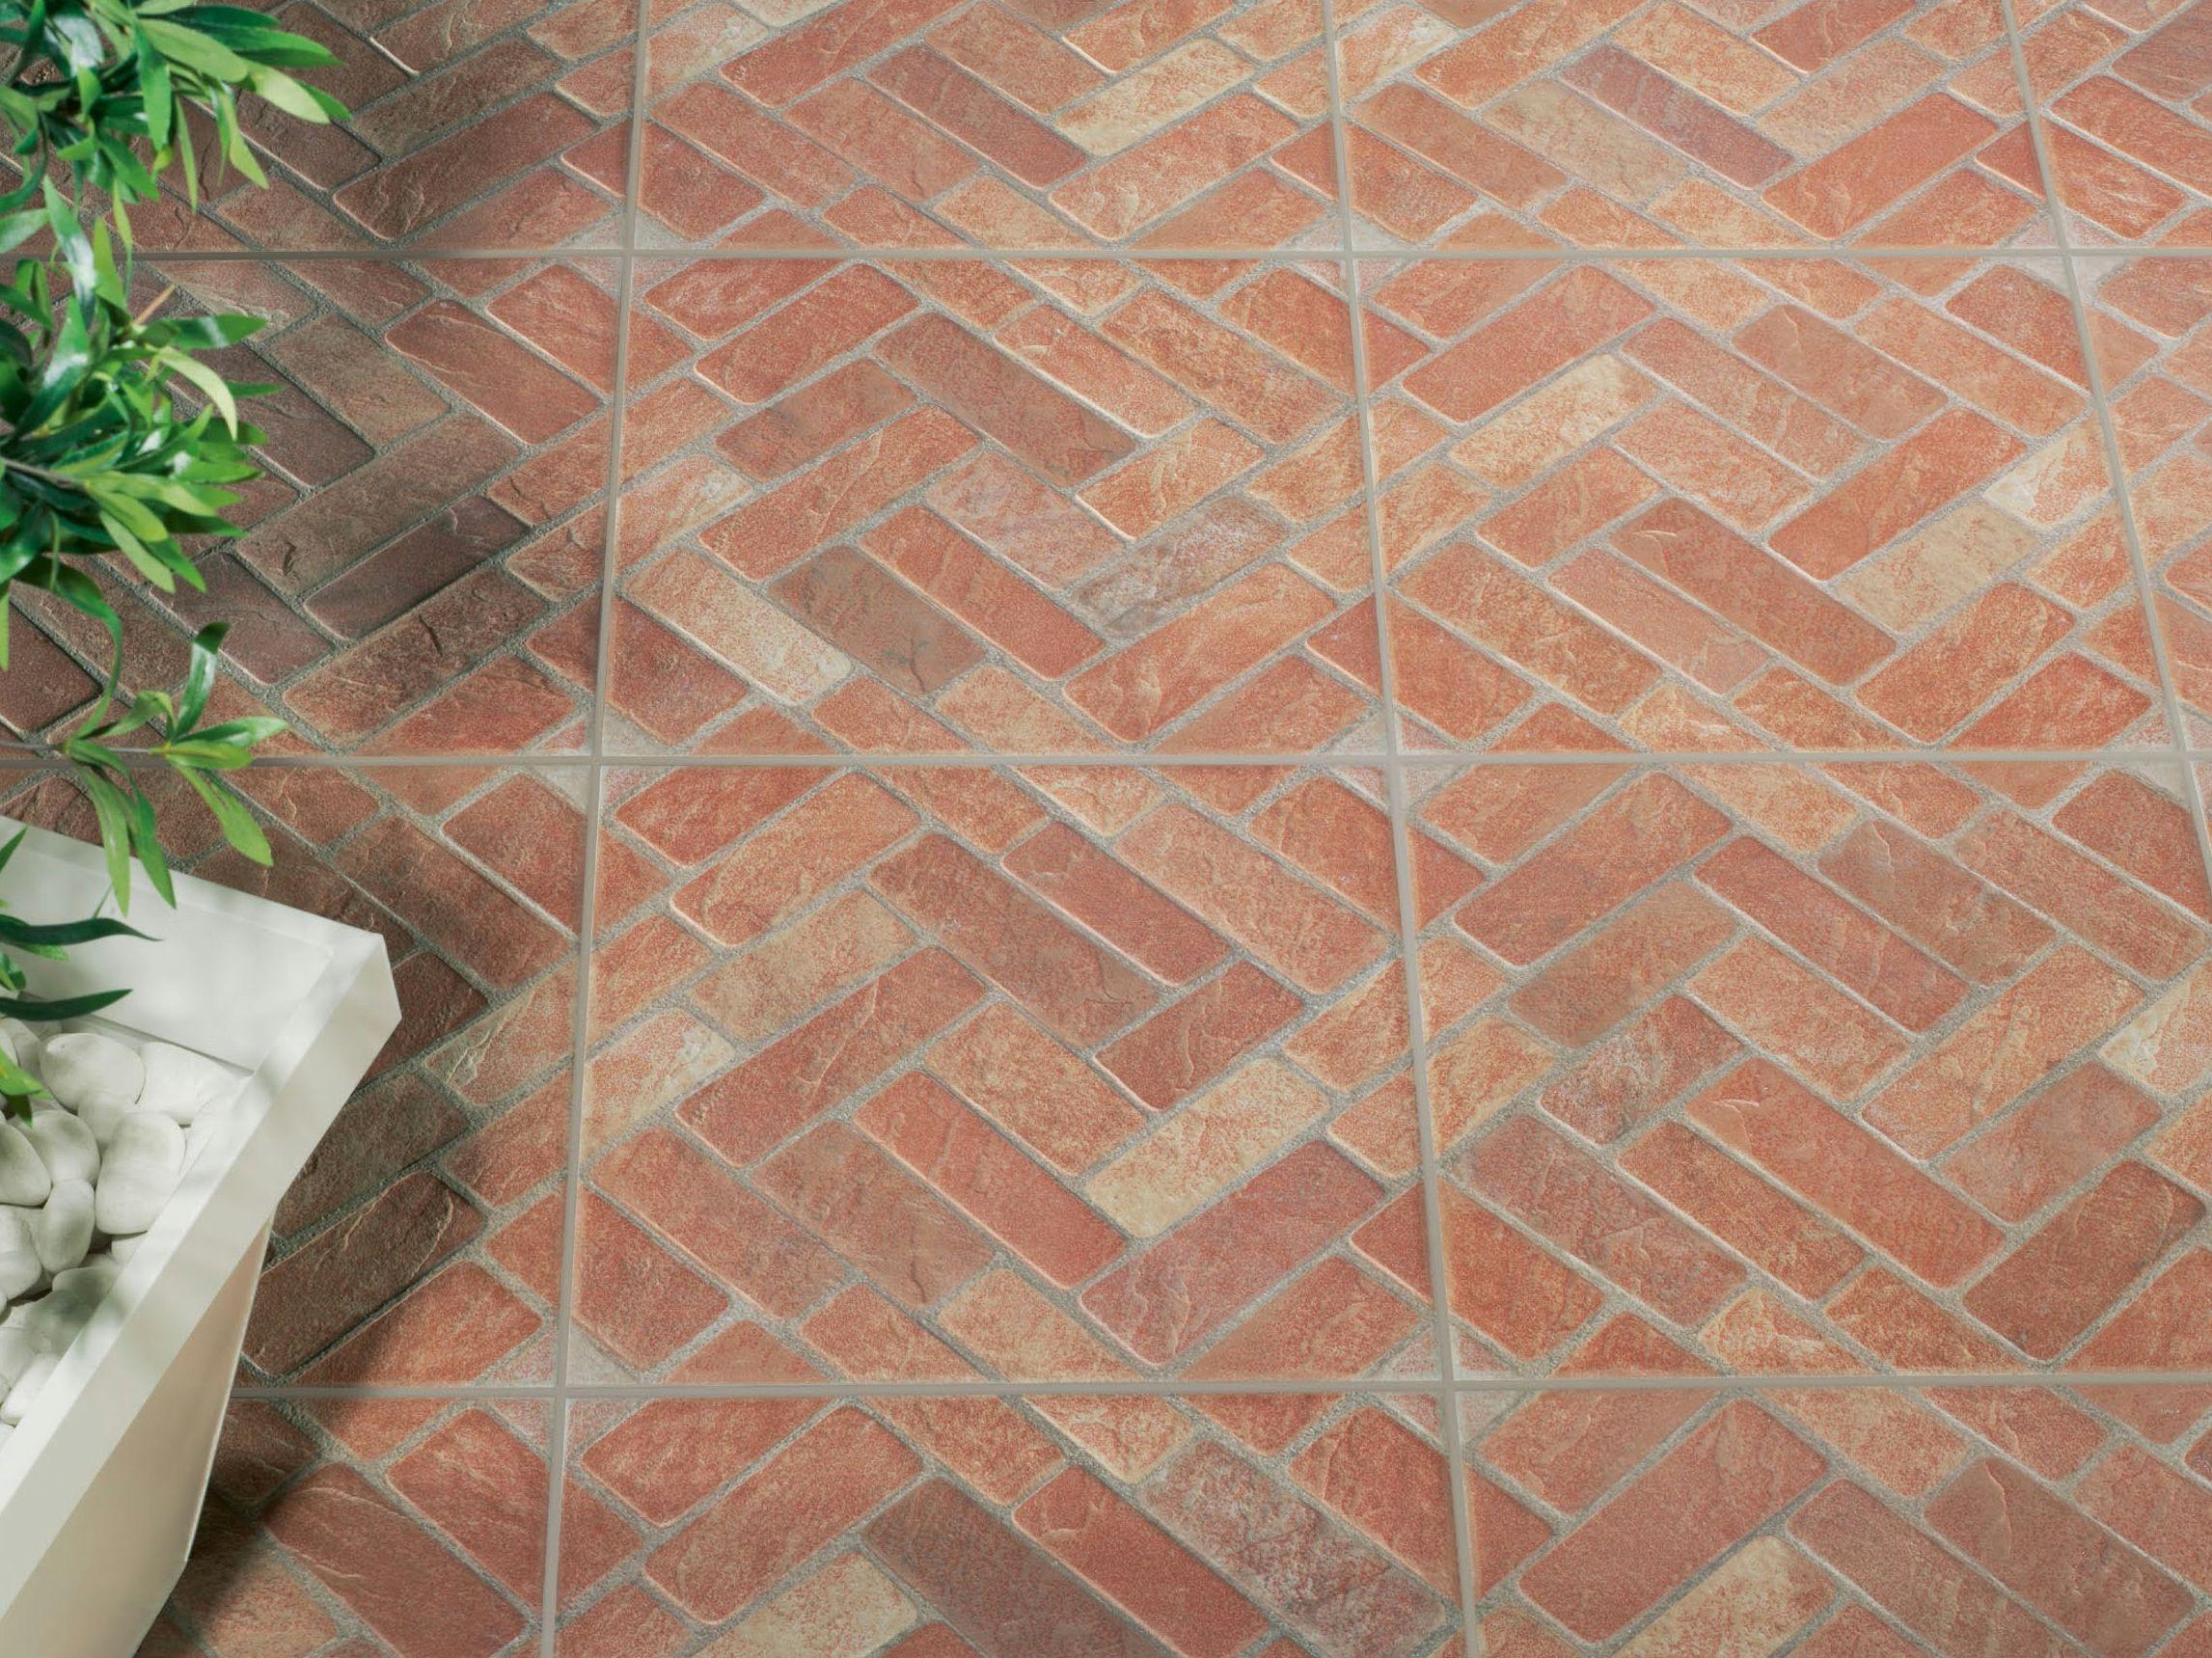 High Quality Exterior Floor Tile Home Pinterest Porcelain Tile